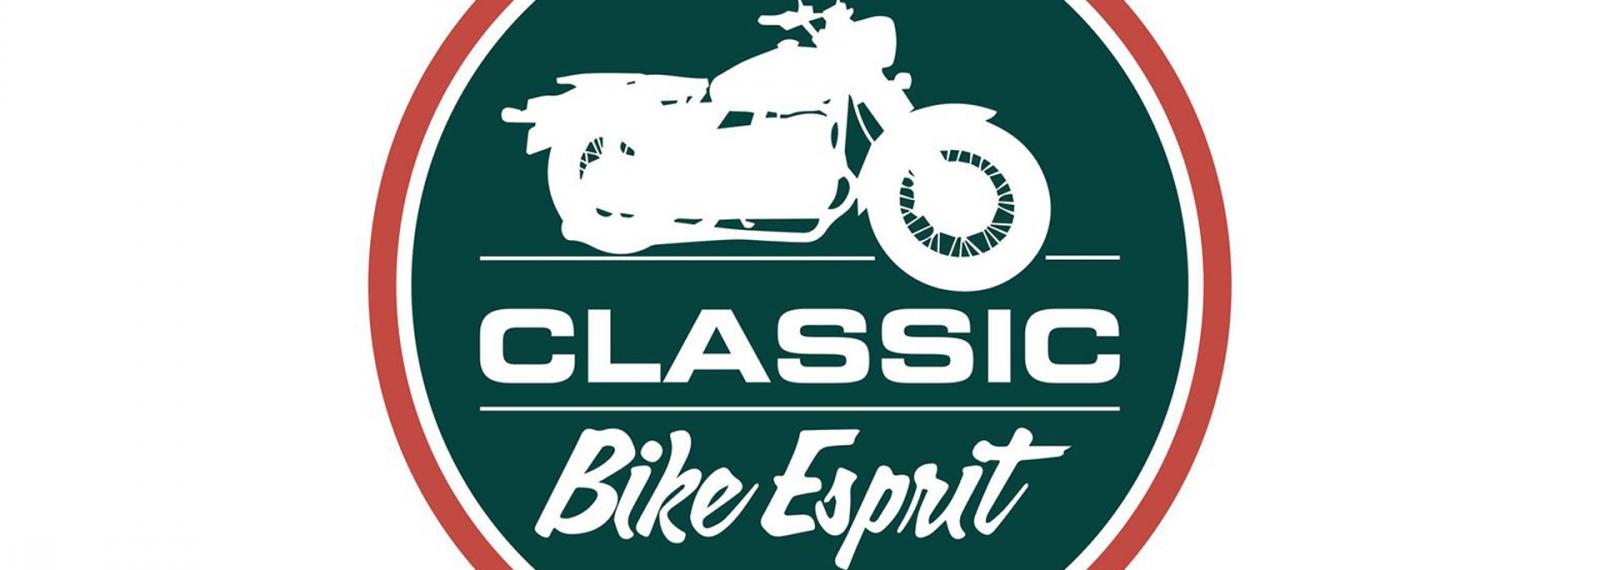 Classic Bike Esprit (motorcycles + sidecar tours )